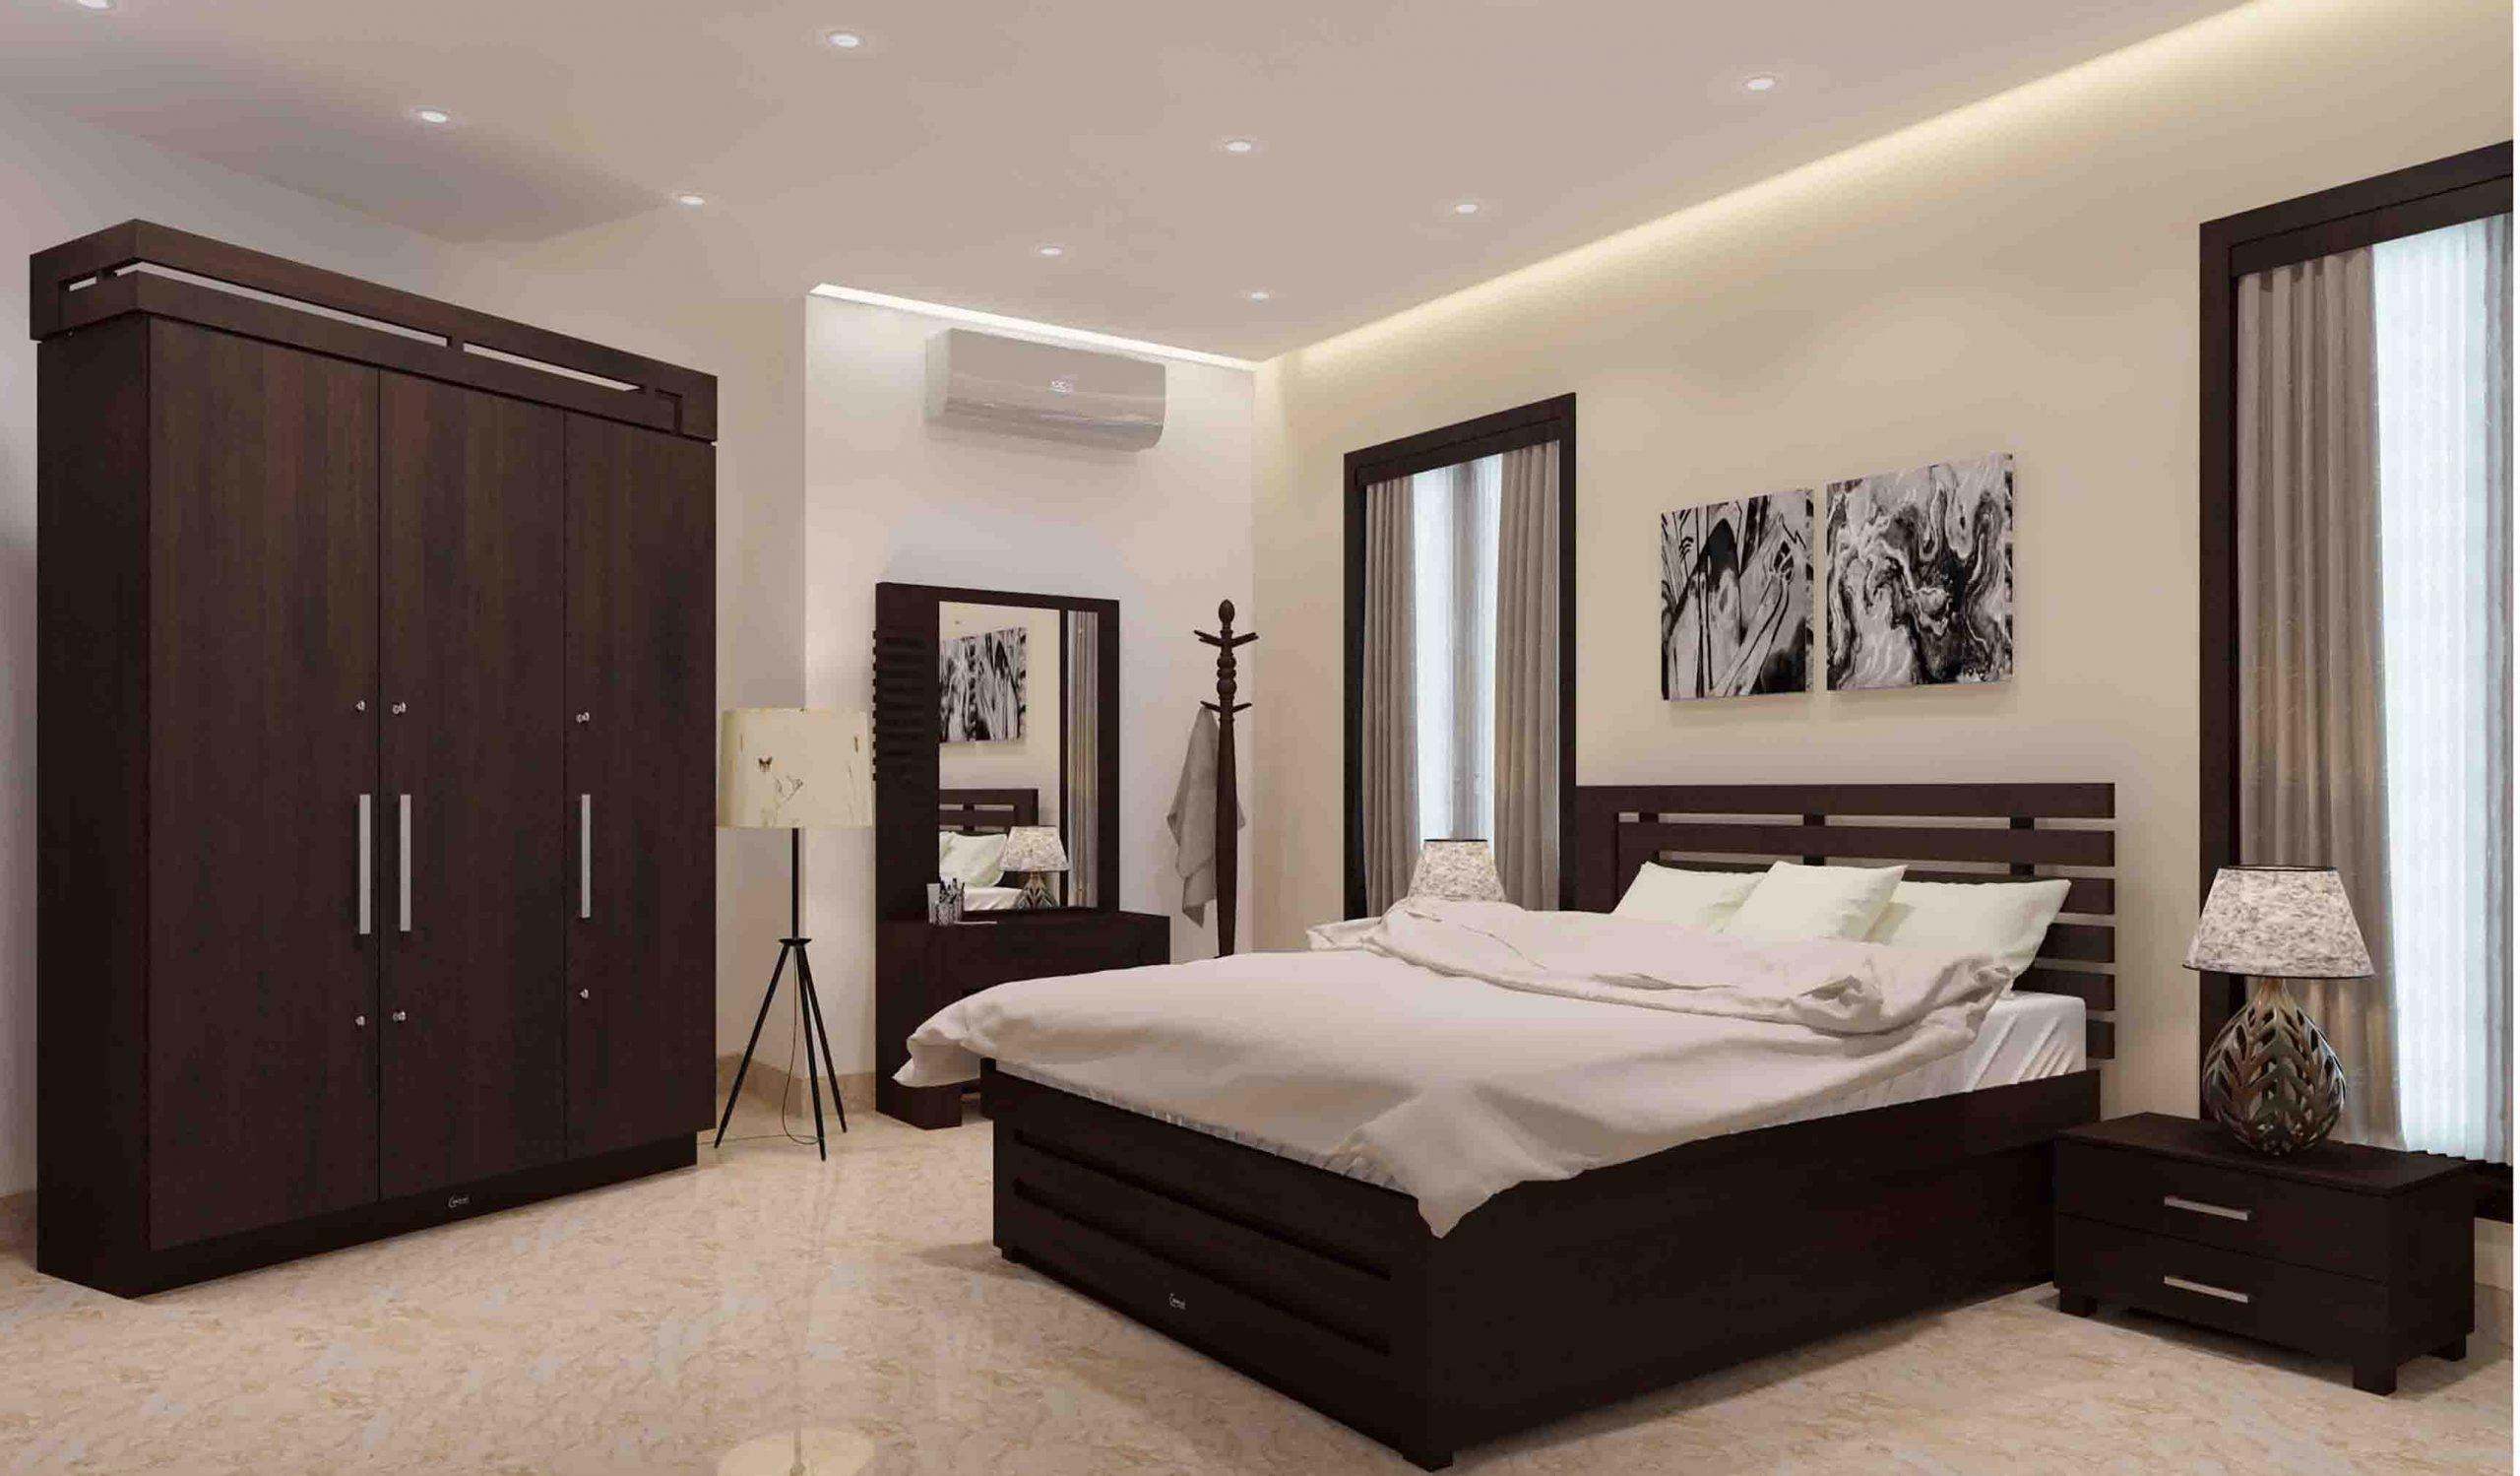 Bed room furniture in kerala